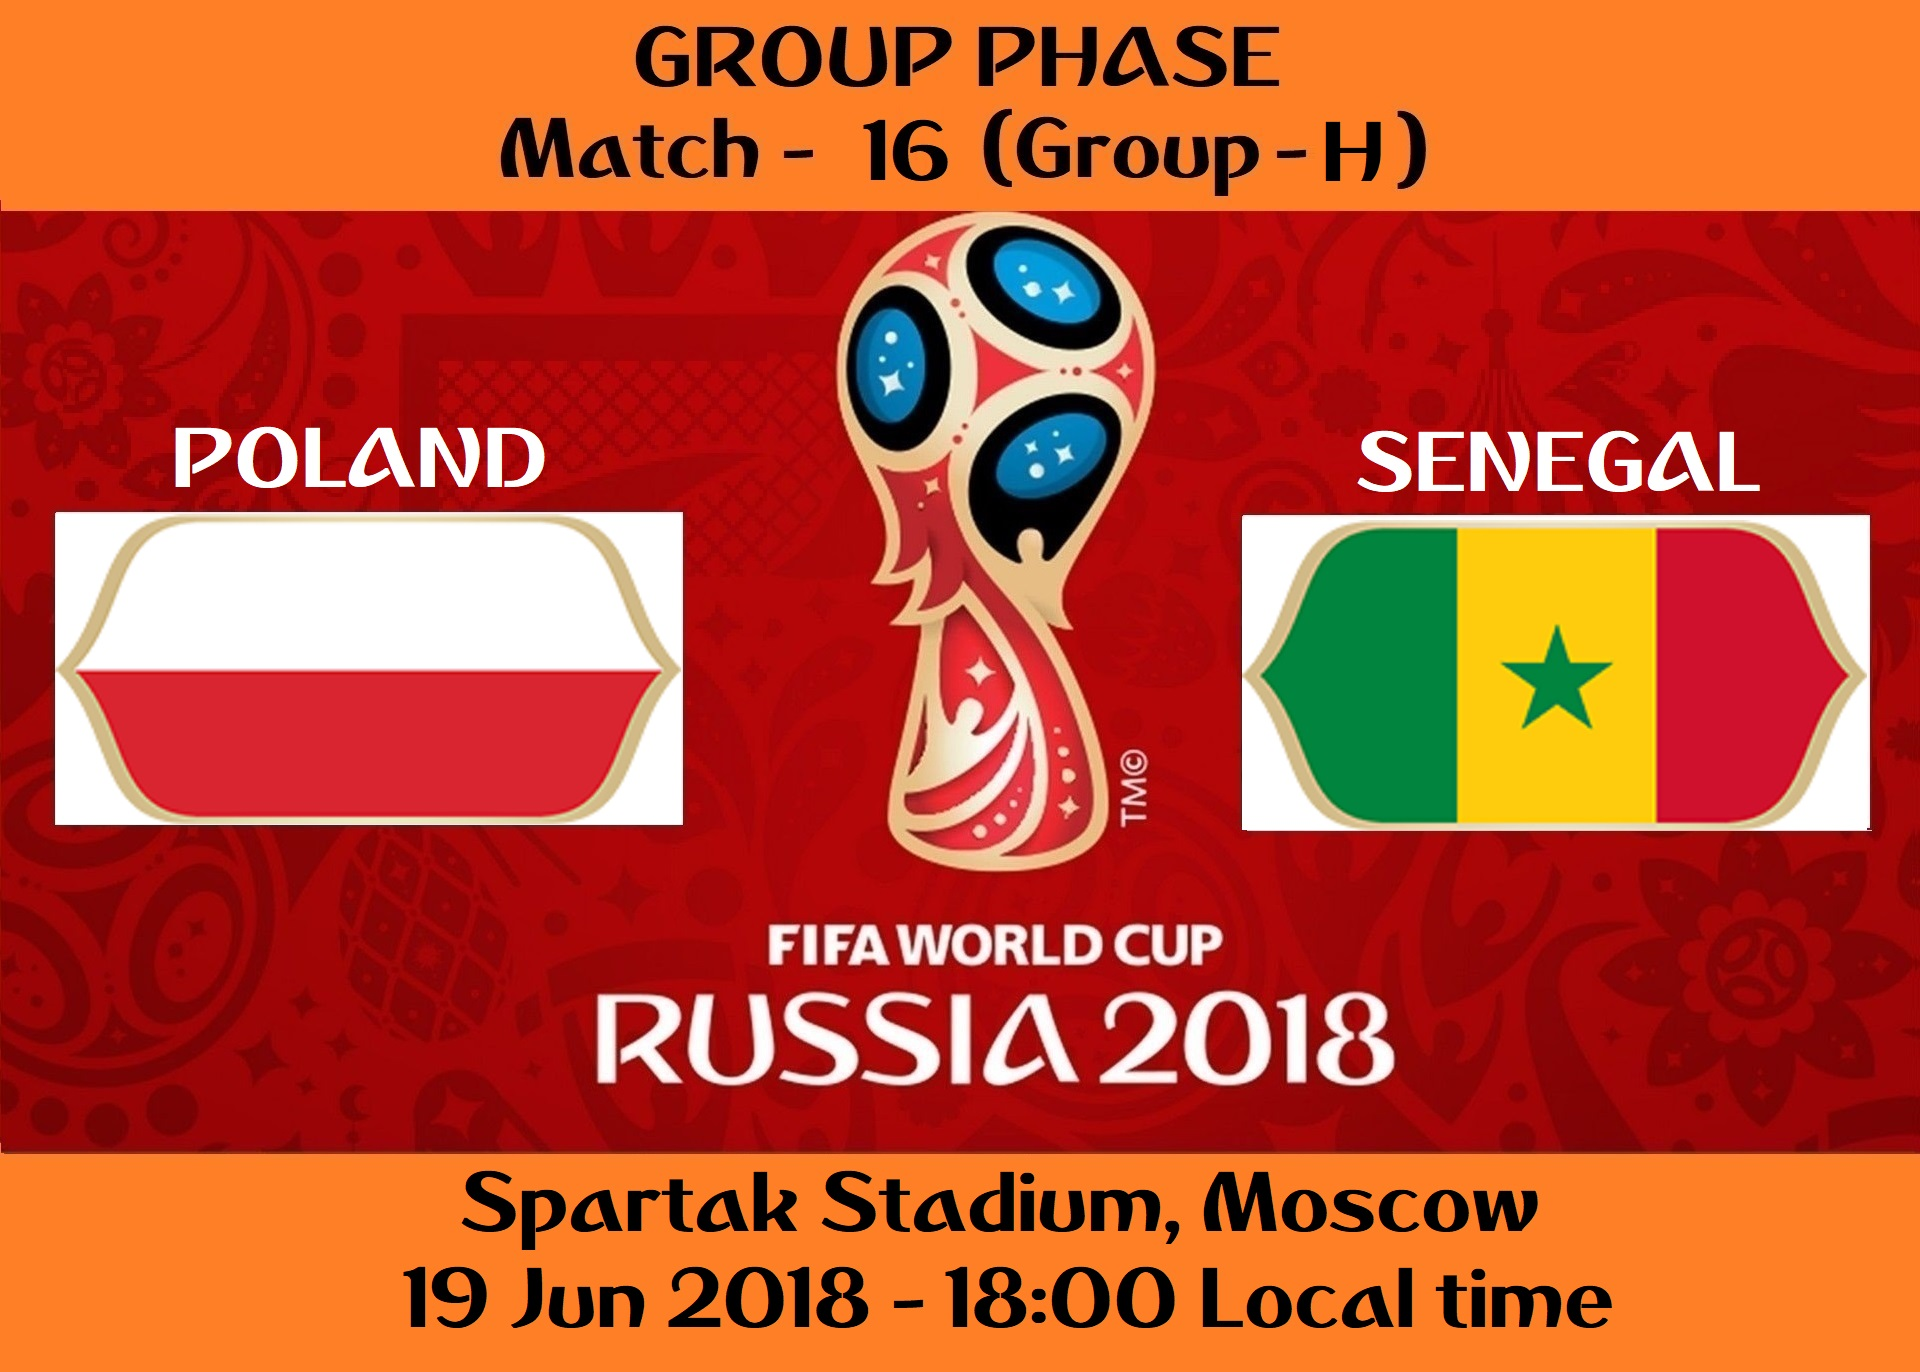 FIFA WORLD CUP 2018 MATCH - 16 - POLAND vs SENEGAL